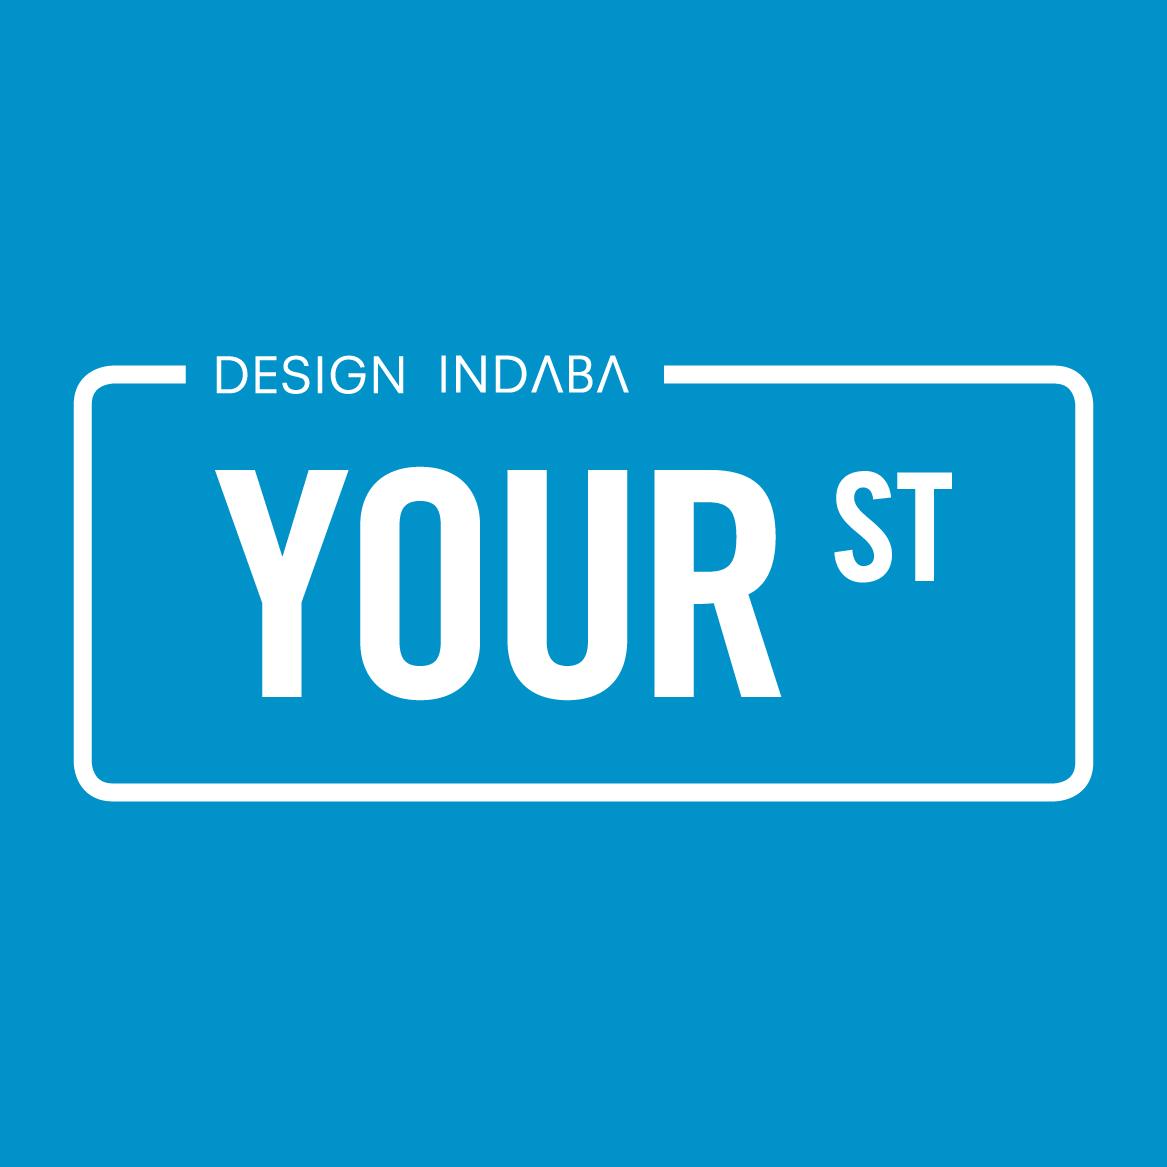 your street design indaba